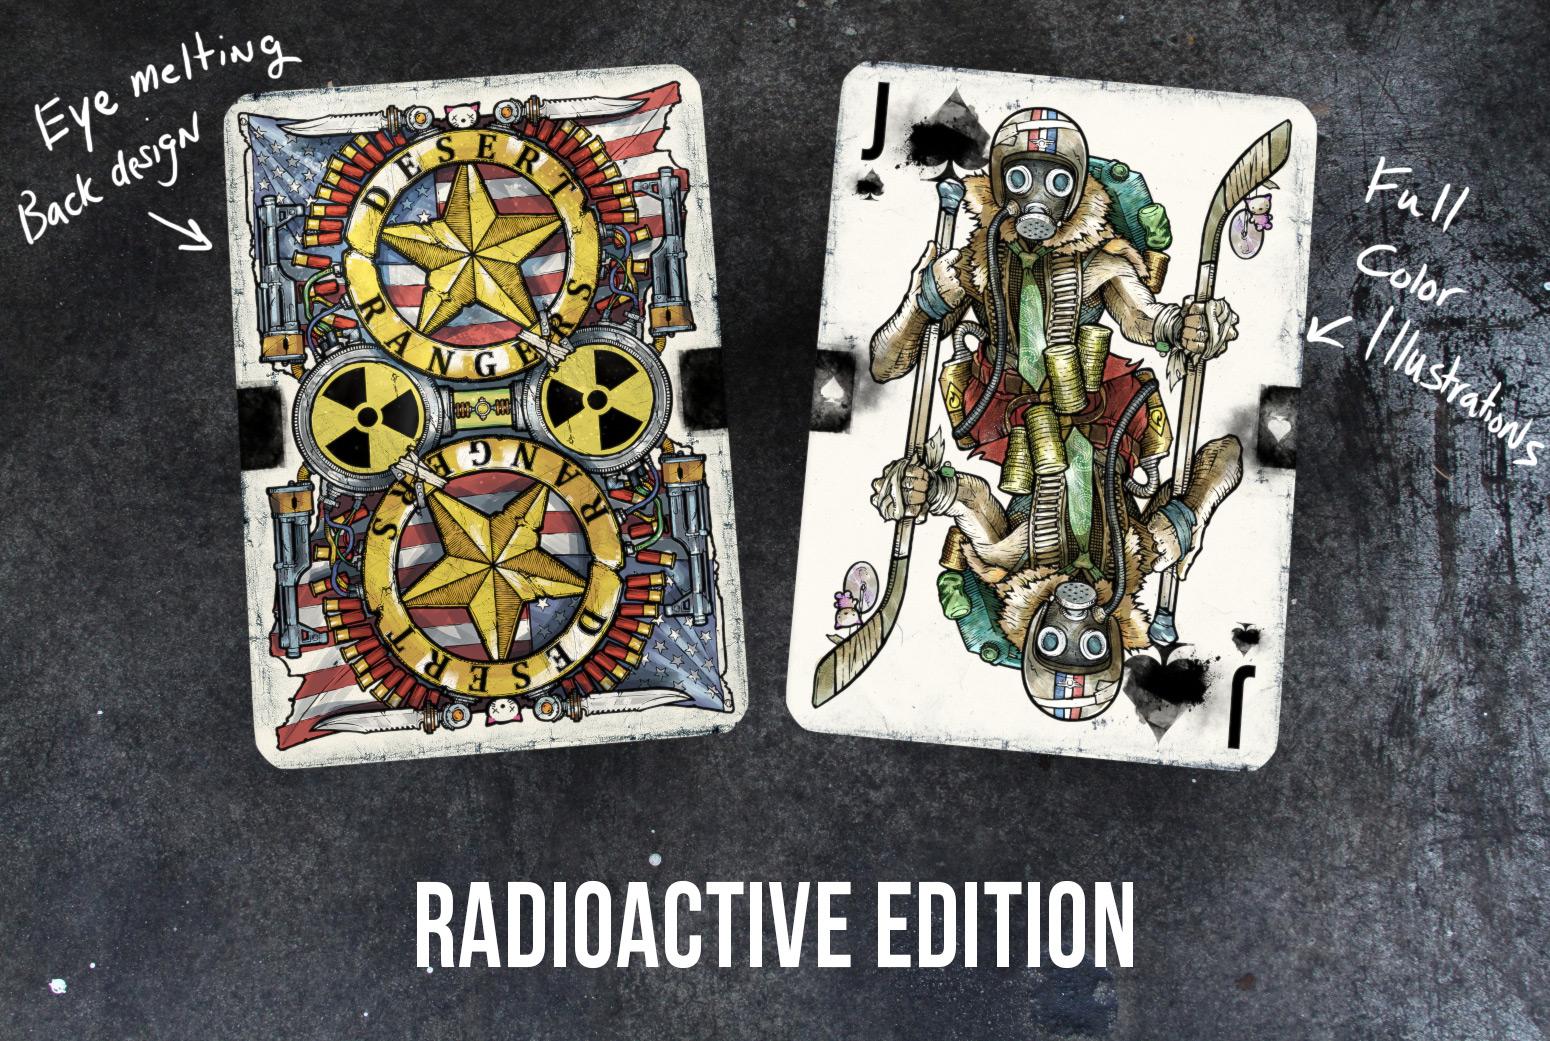 radioactivecarddetails.jpg